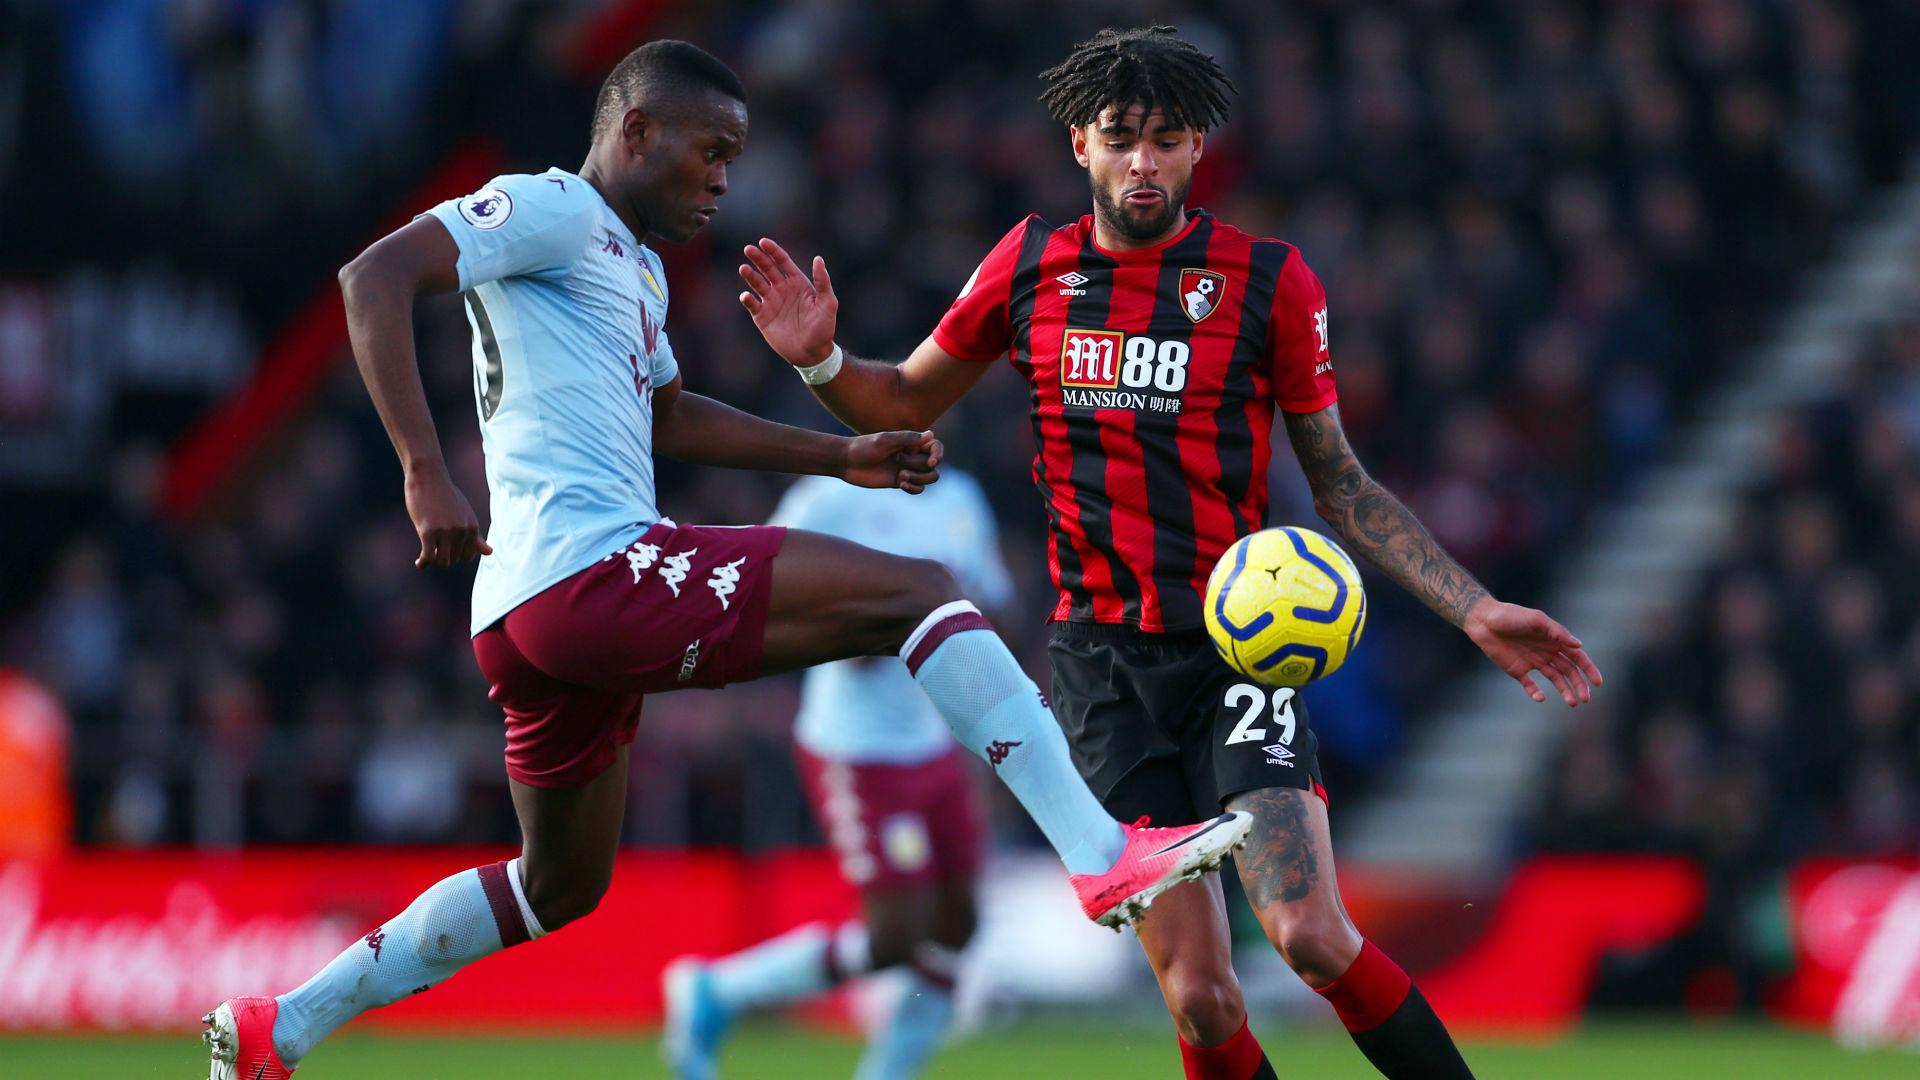 Samatta: Tanzania forward reveals Drogba, Ronaldo inspiration & best Aston Villa friend